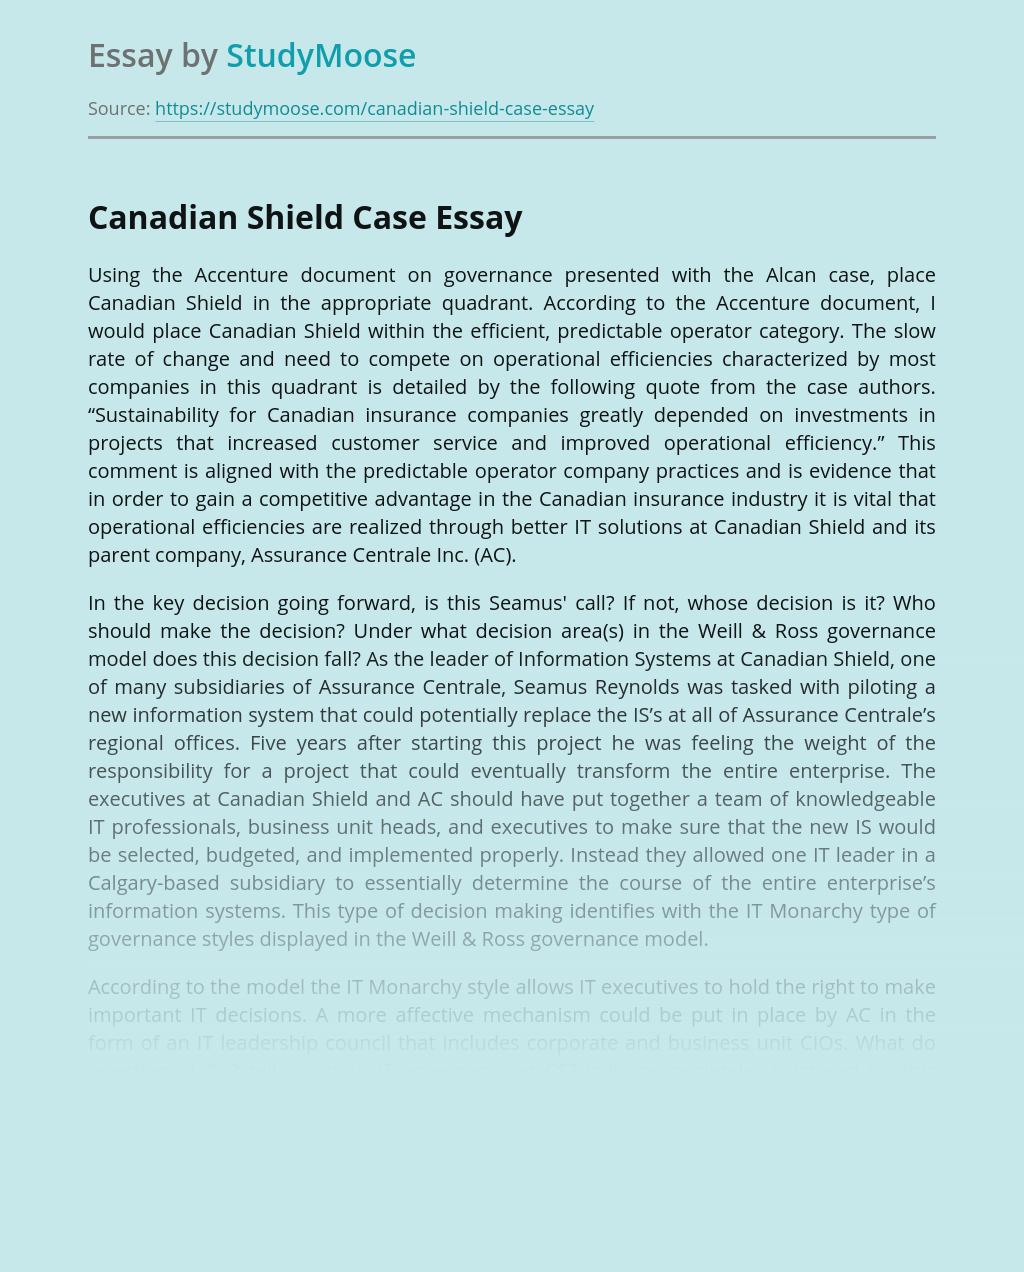 Canadian Shield Case